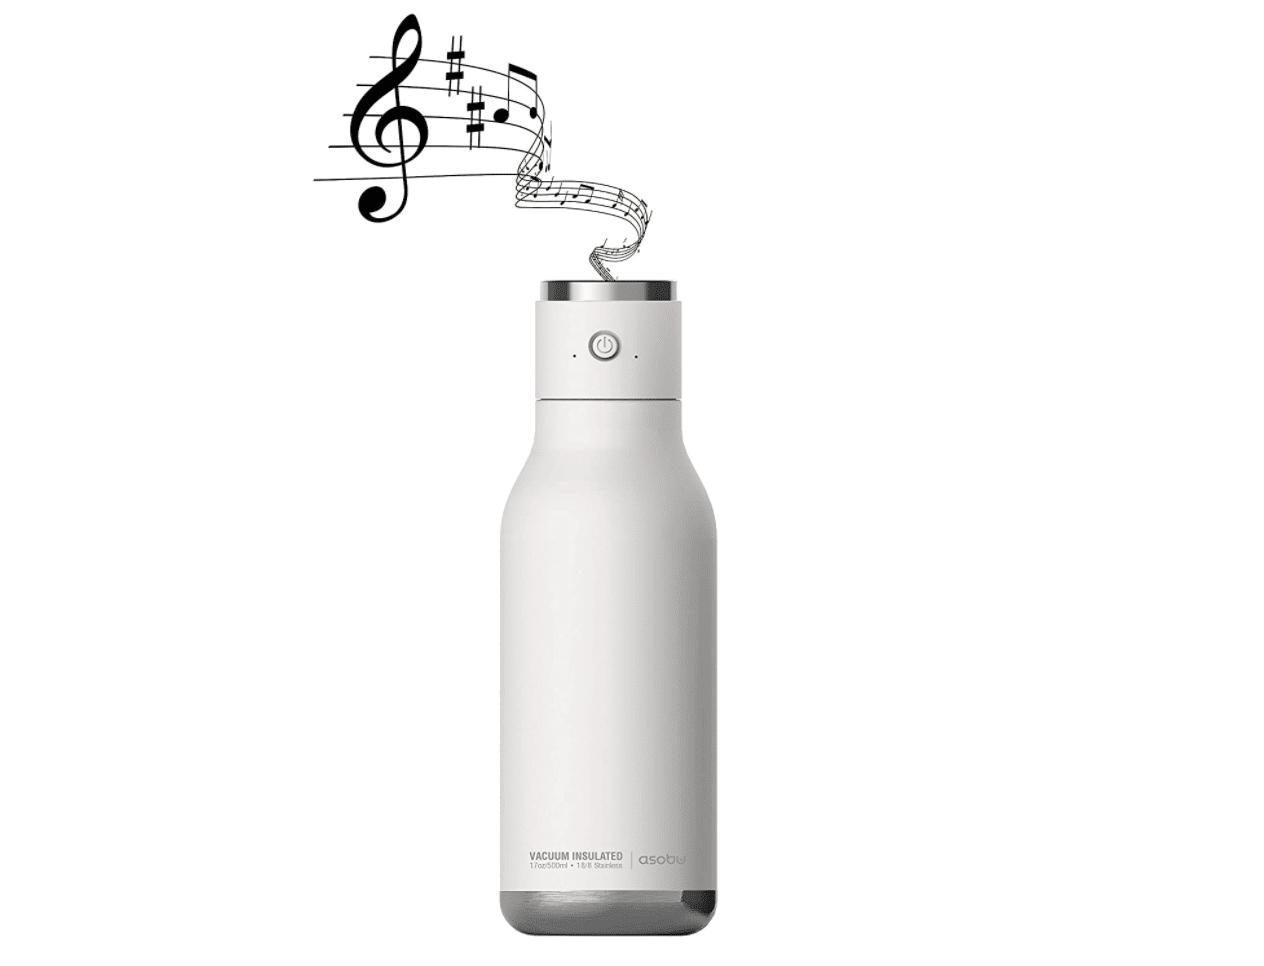 40th-birthday-gift-ideas-bottle